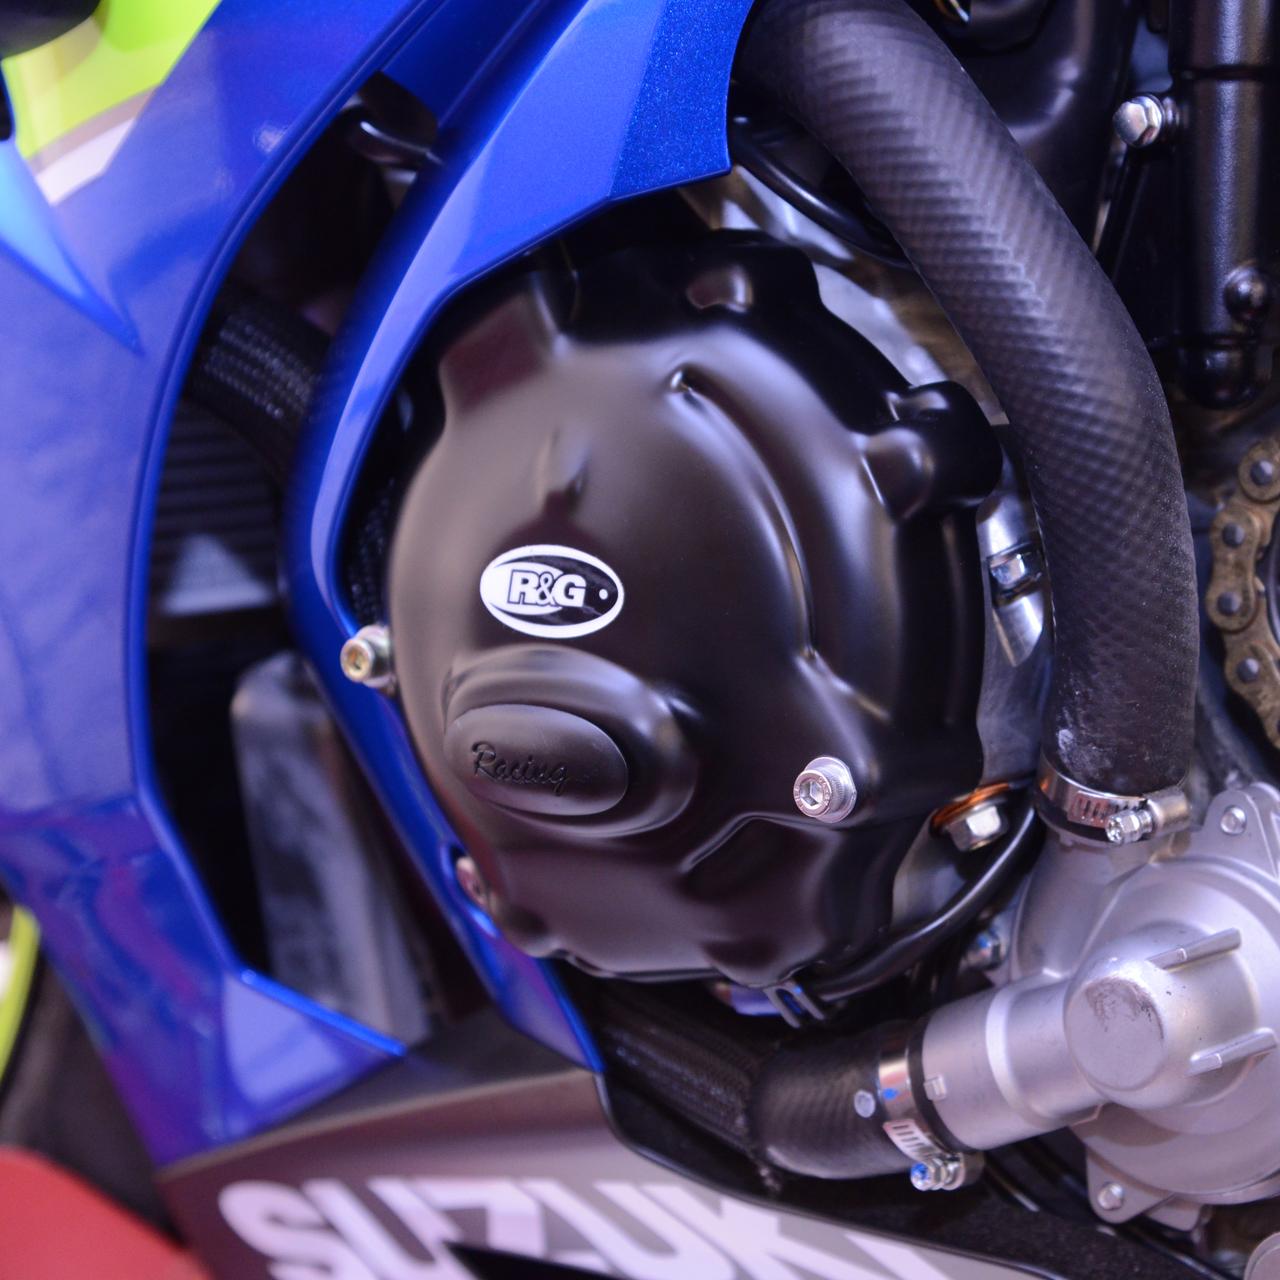 R&G Racing Suzuki GSX-R1000 17-19 Race Series Left Side Engine Case Cover